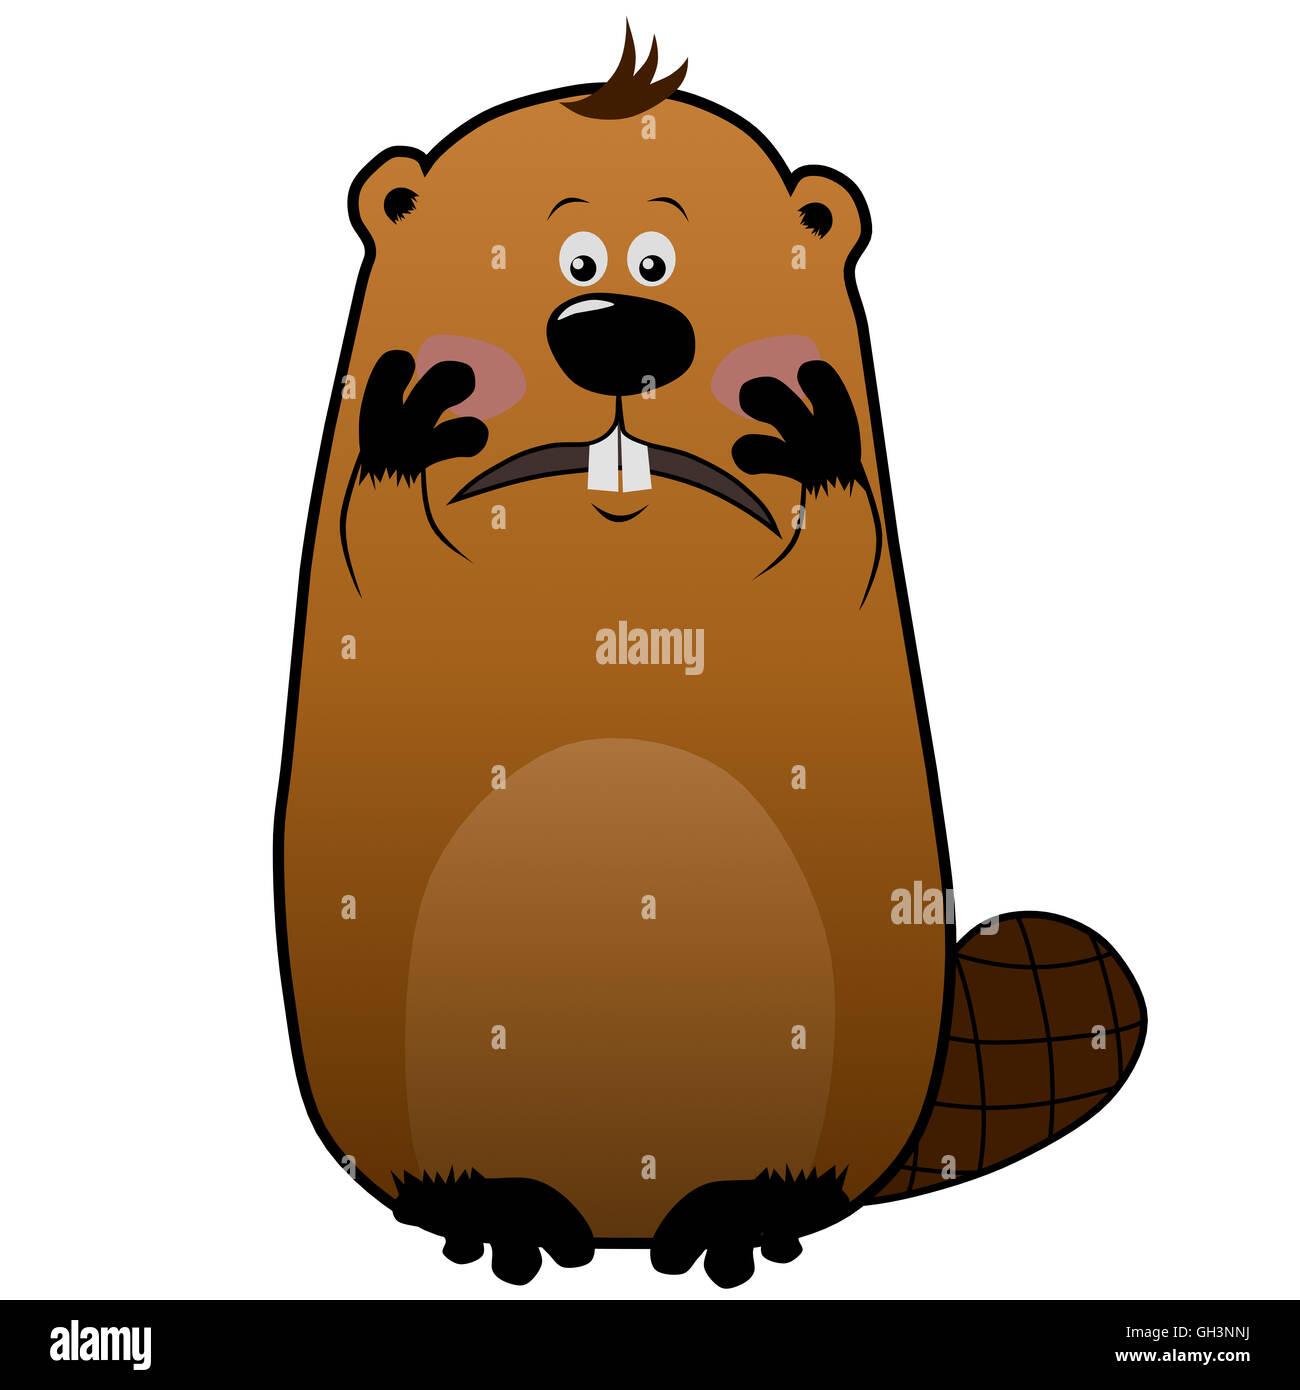 Embarassed cartoon beaver on white background, emotions - Stock Image